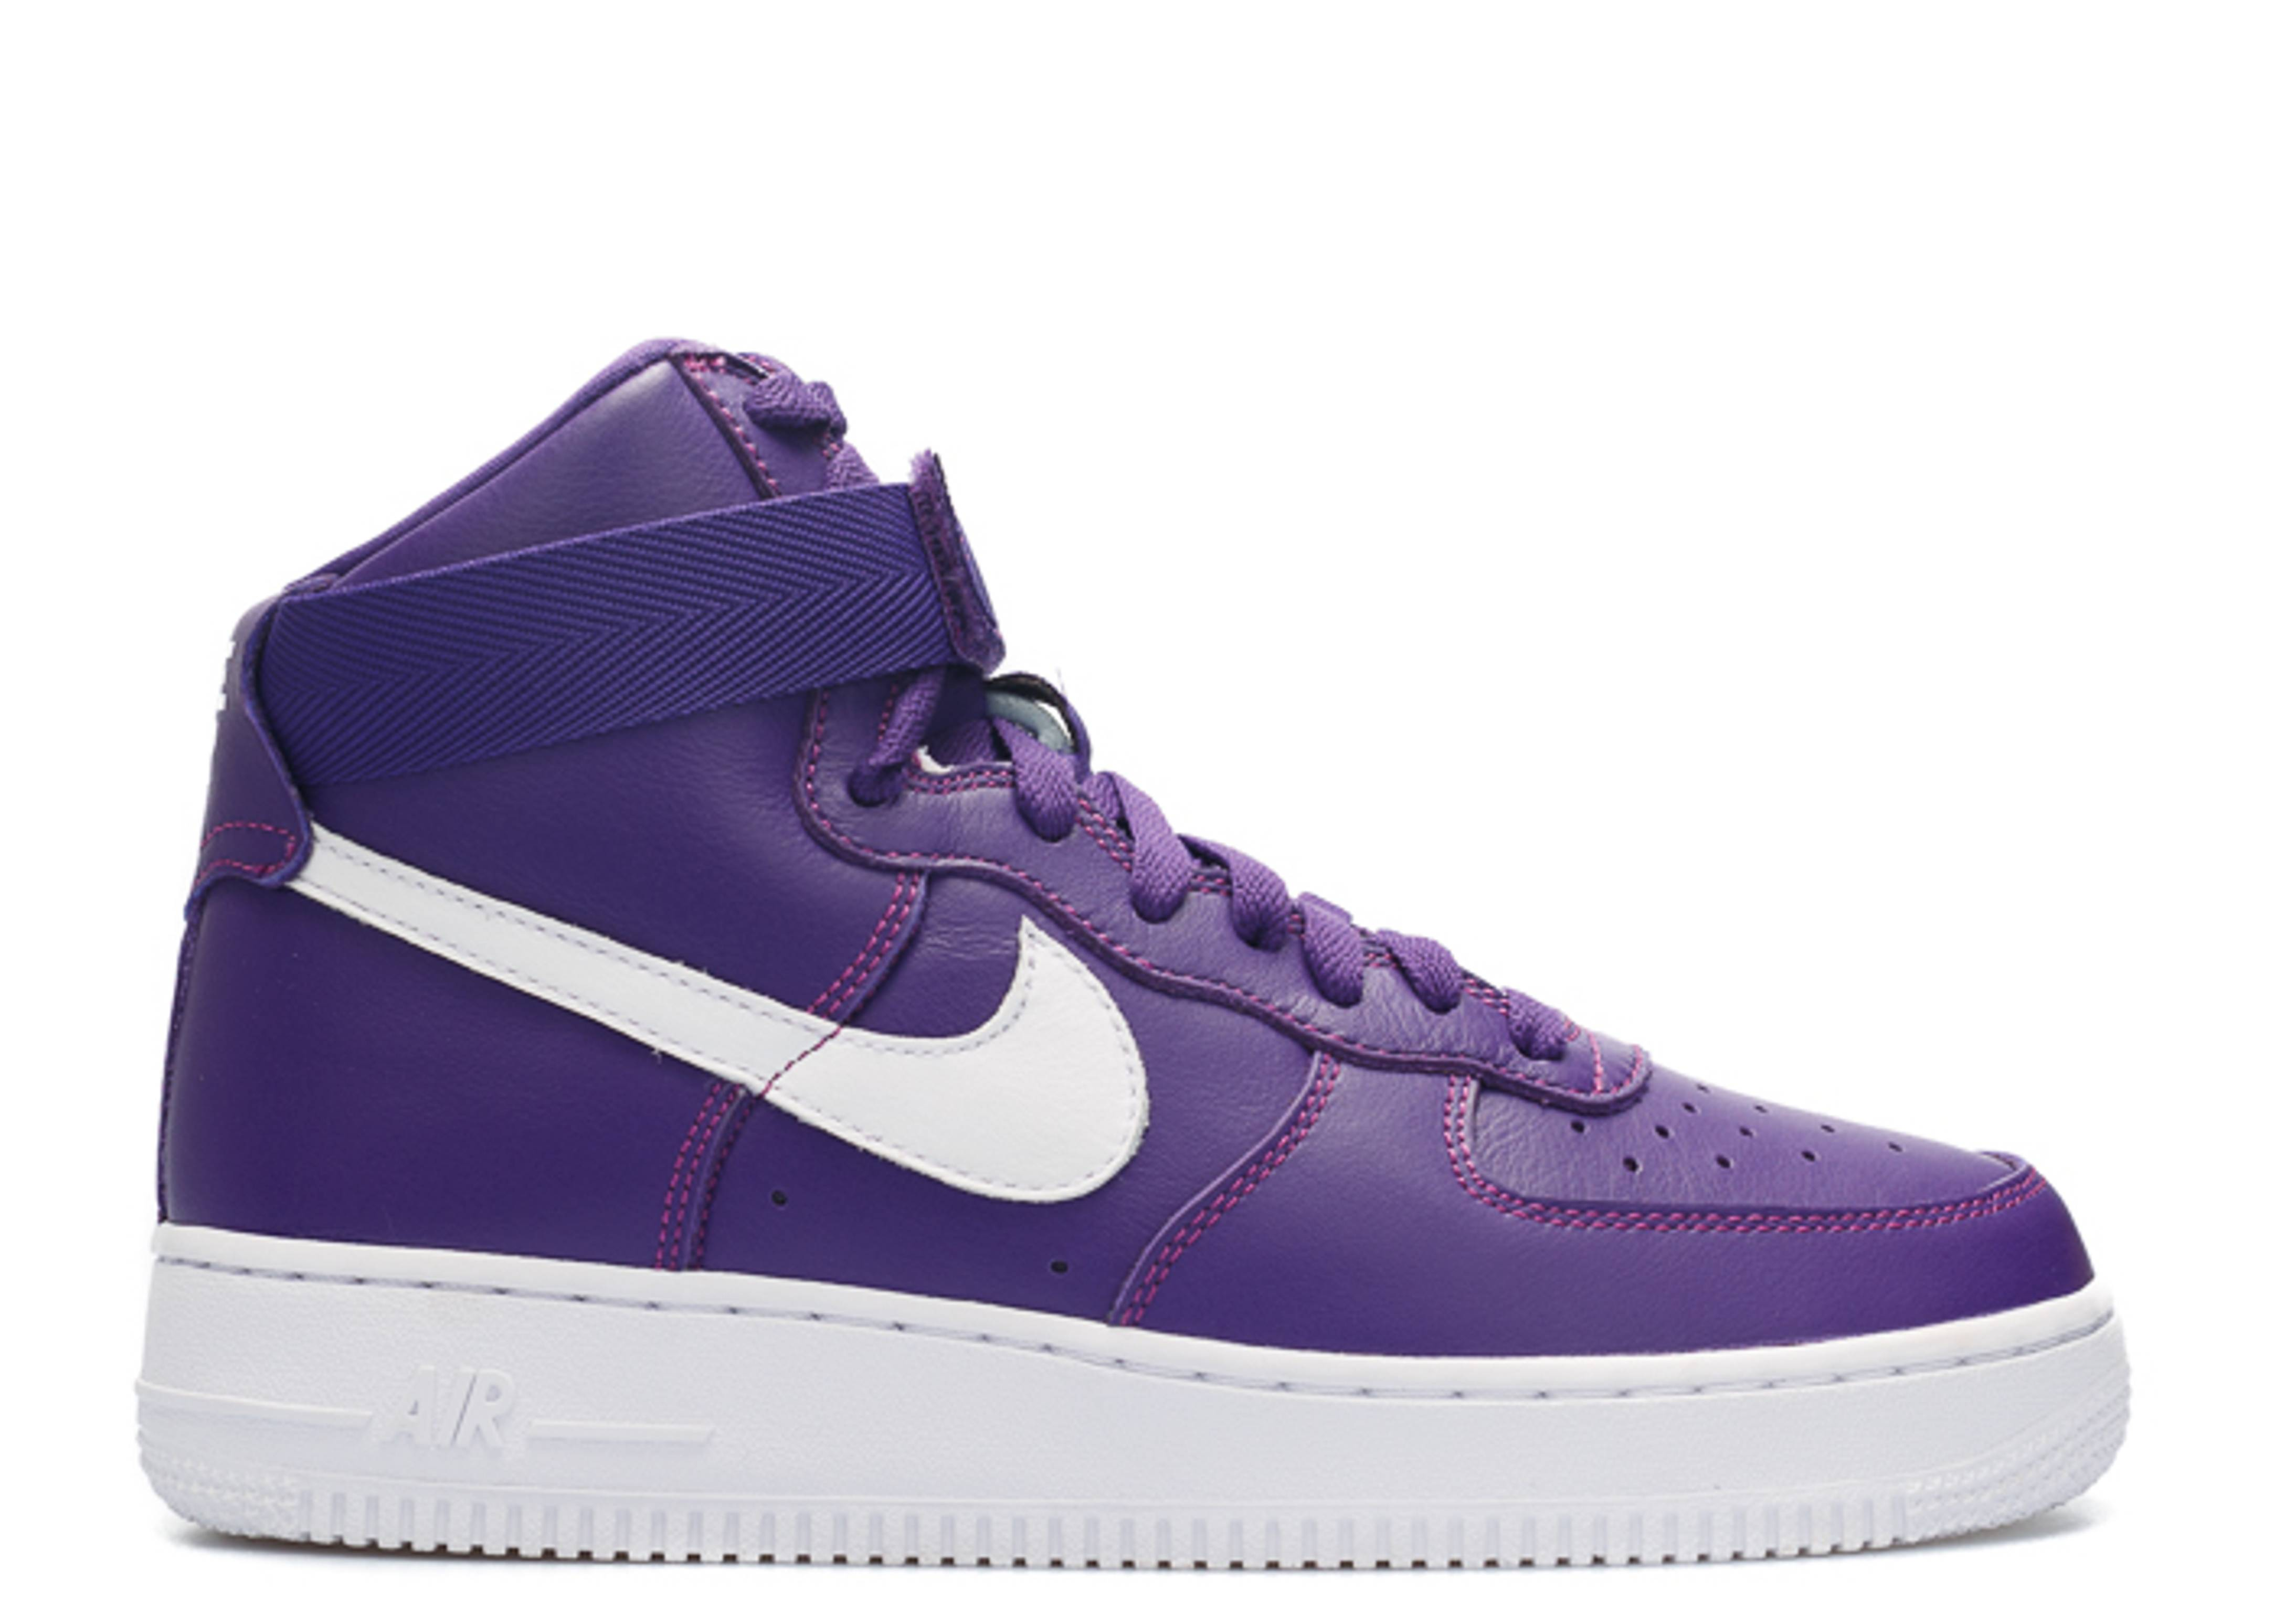 ... shop air force 1 high retro qs nike 823297 500 purple purple white  flight club 6b8df 799d890e9